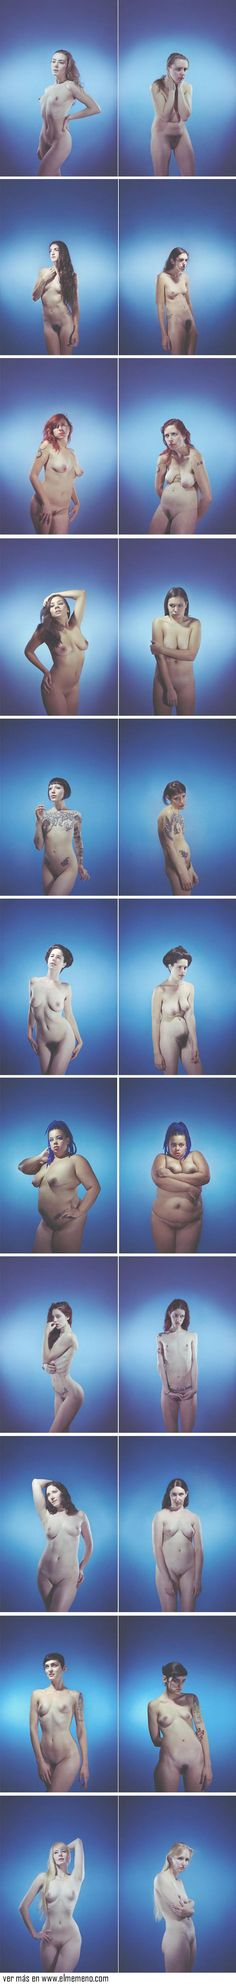 La fotógrafa norteamericana Gracie Hagen fotografió a diferentes personas con…